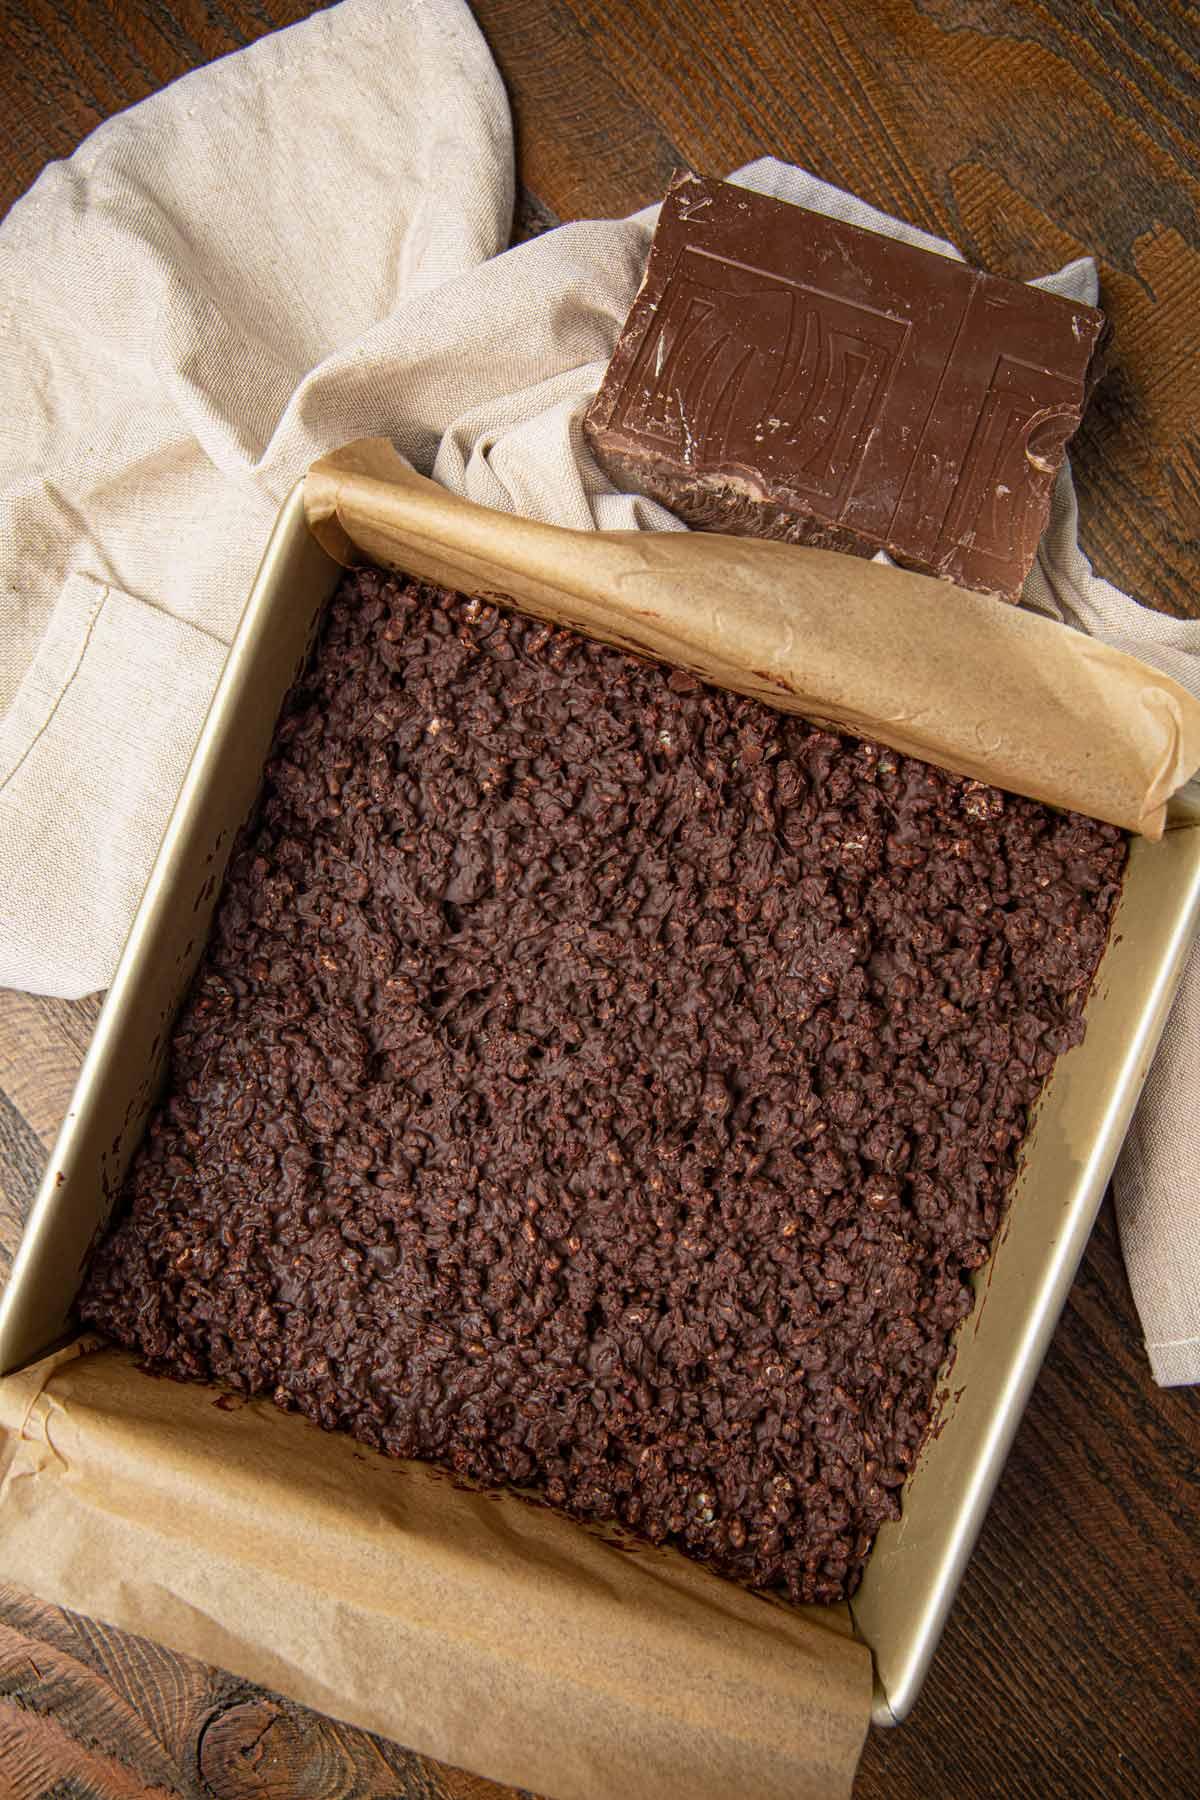 Pan of Crunch Bars